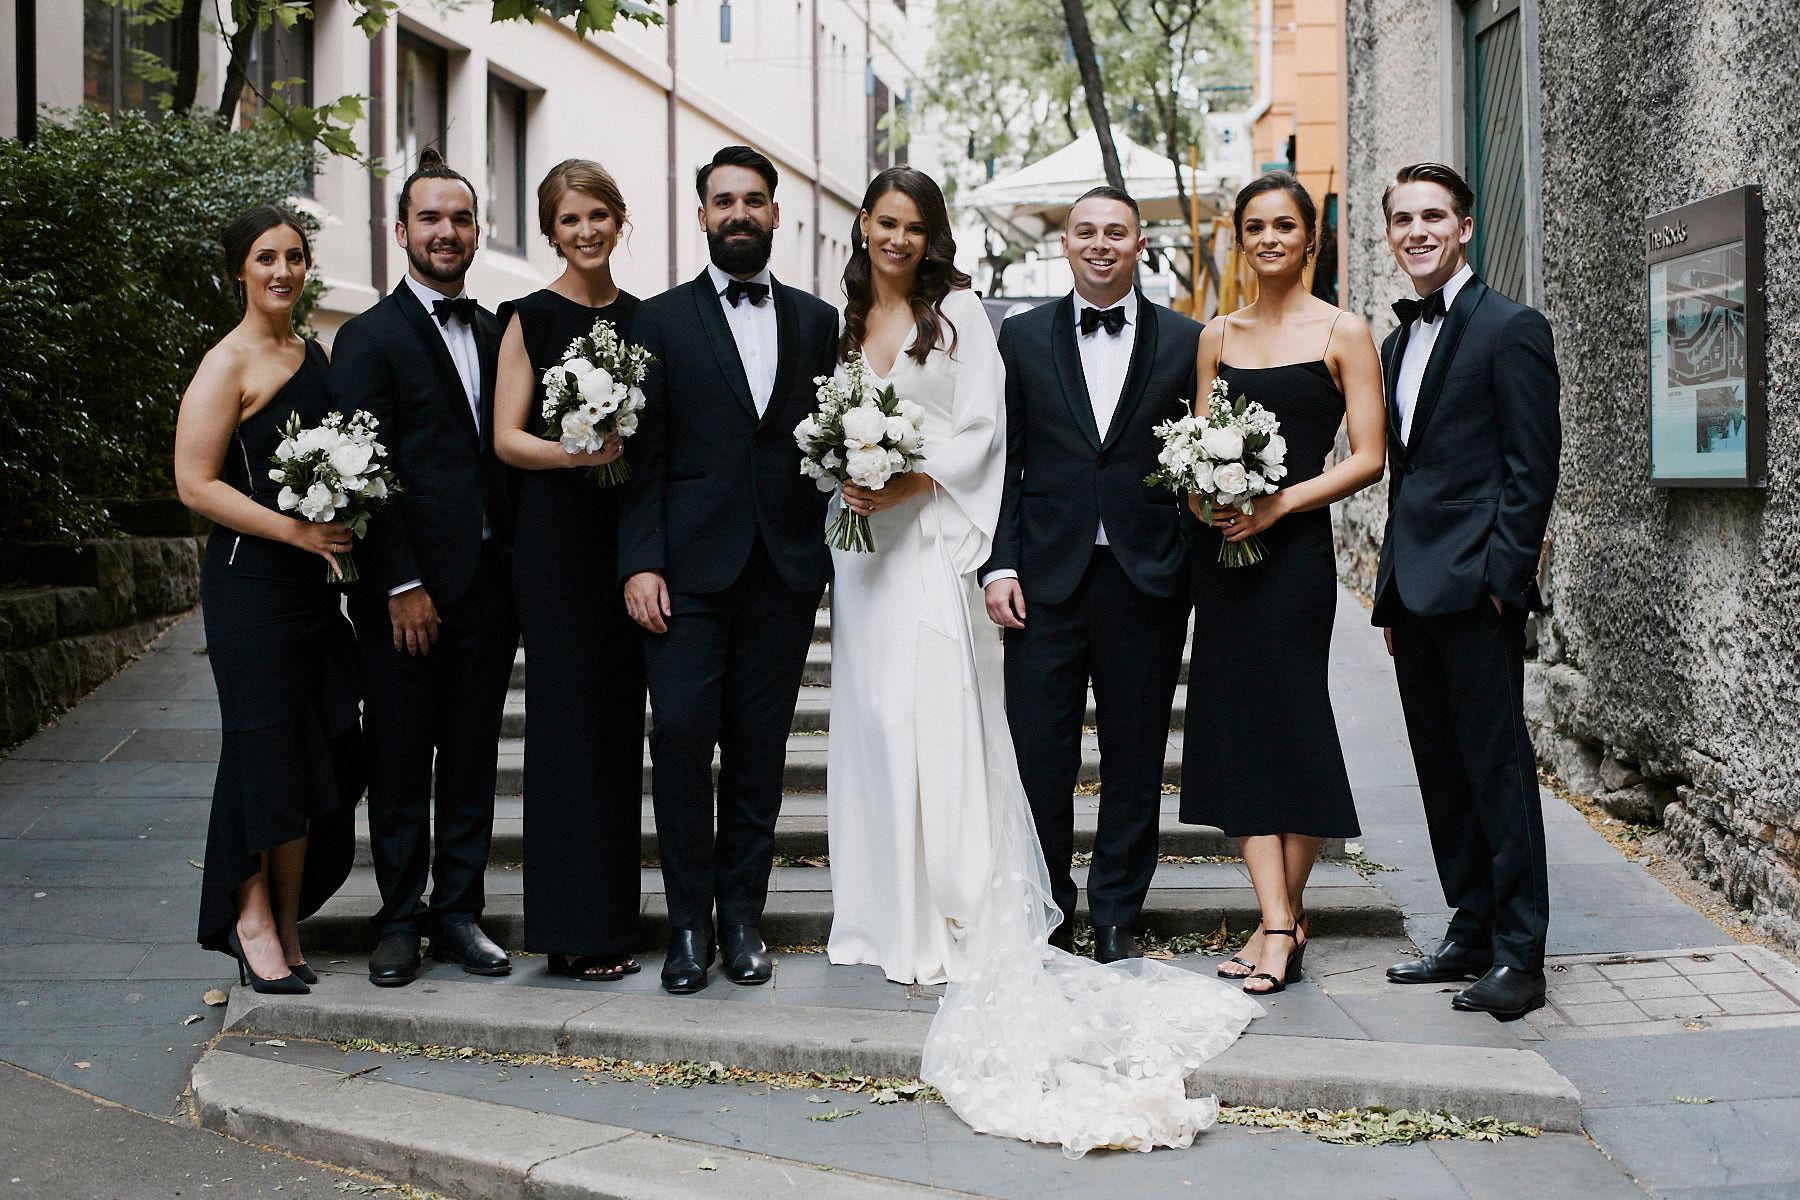 TheLovedOnes-Michelle&Jackson-24Nov18-278.jpg